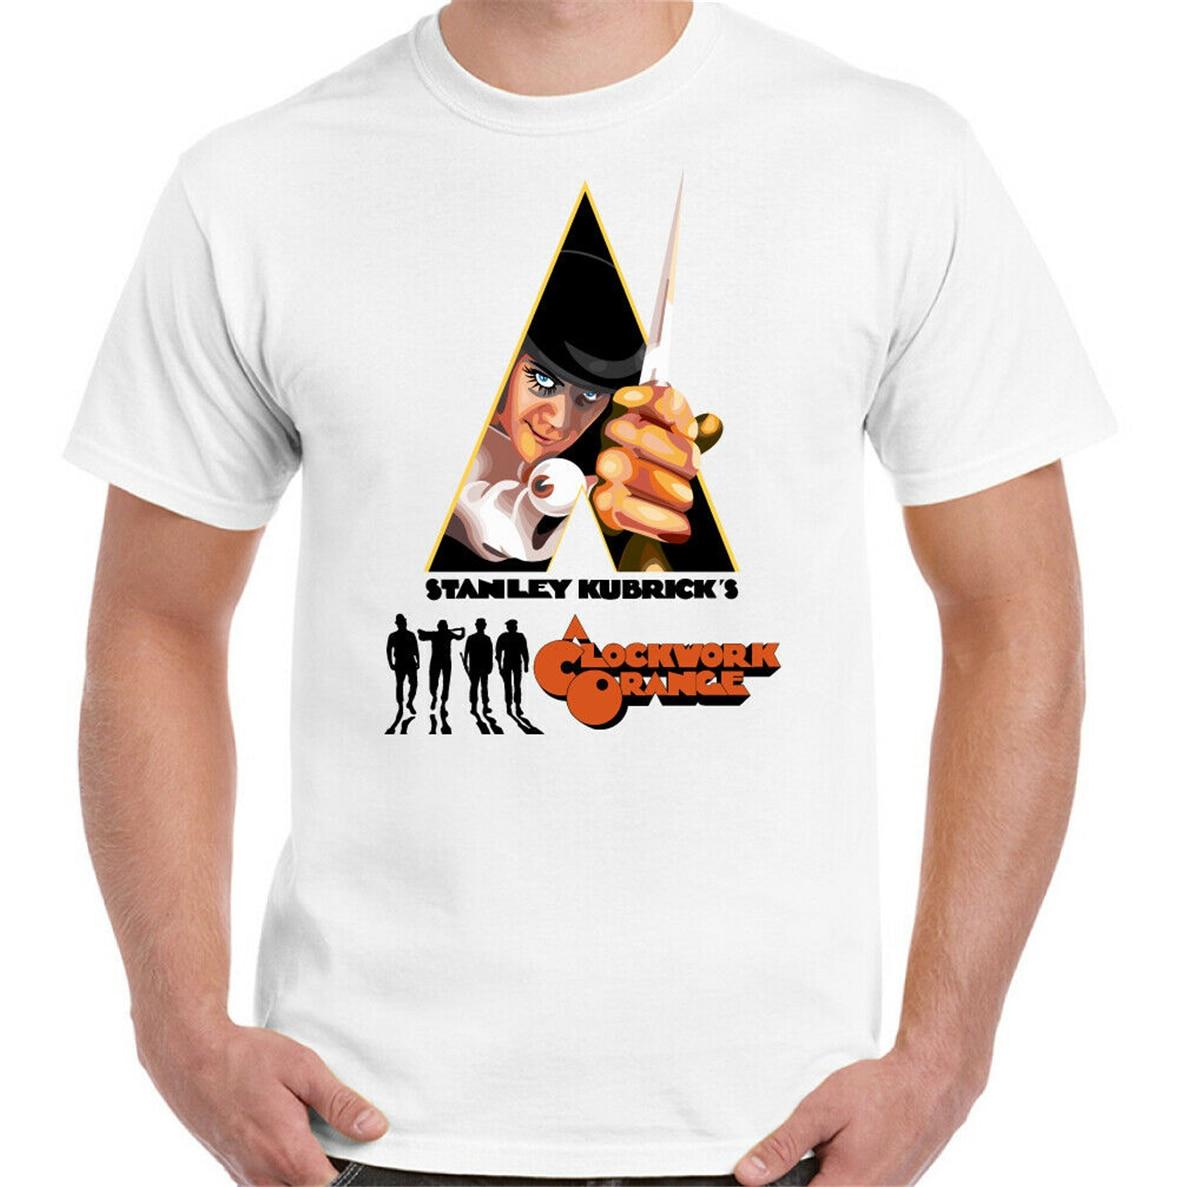 A Clockwork, camiseta naranja para hombres, Retro 70s, película Stanley kuladrillo, póster, camiseta de película, camisetas de manga corta, camiseta